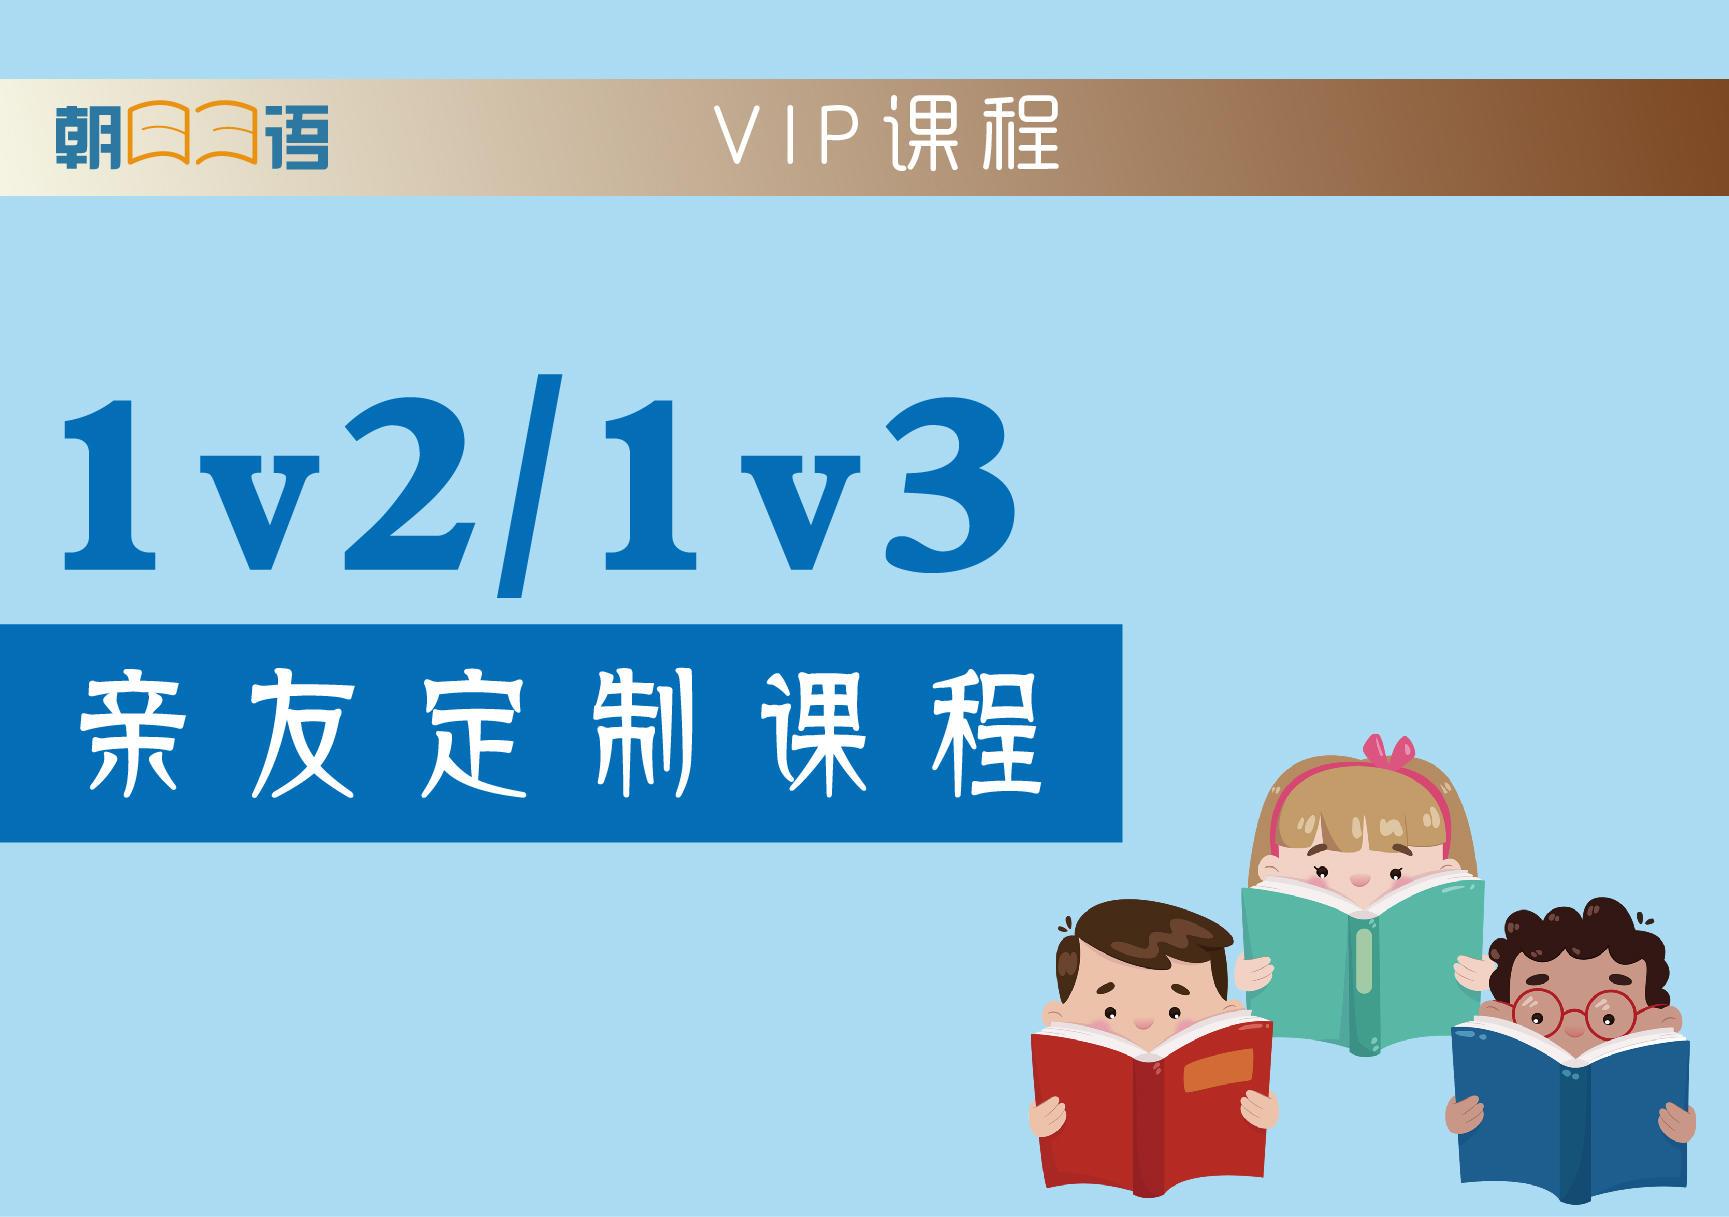 VIP 1V2/1V3亲友定制课程